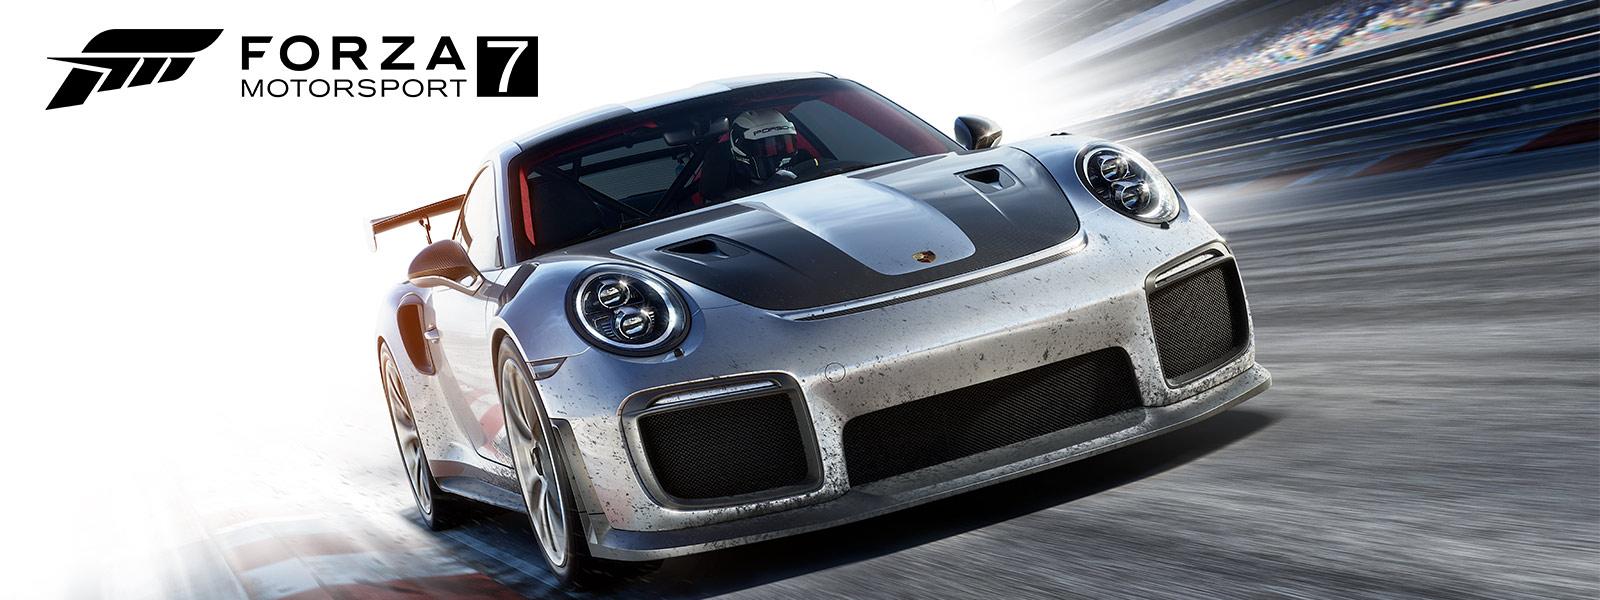 Ecrã do jogo Forza Motorsport 7